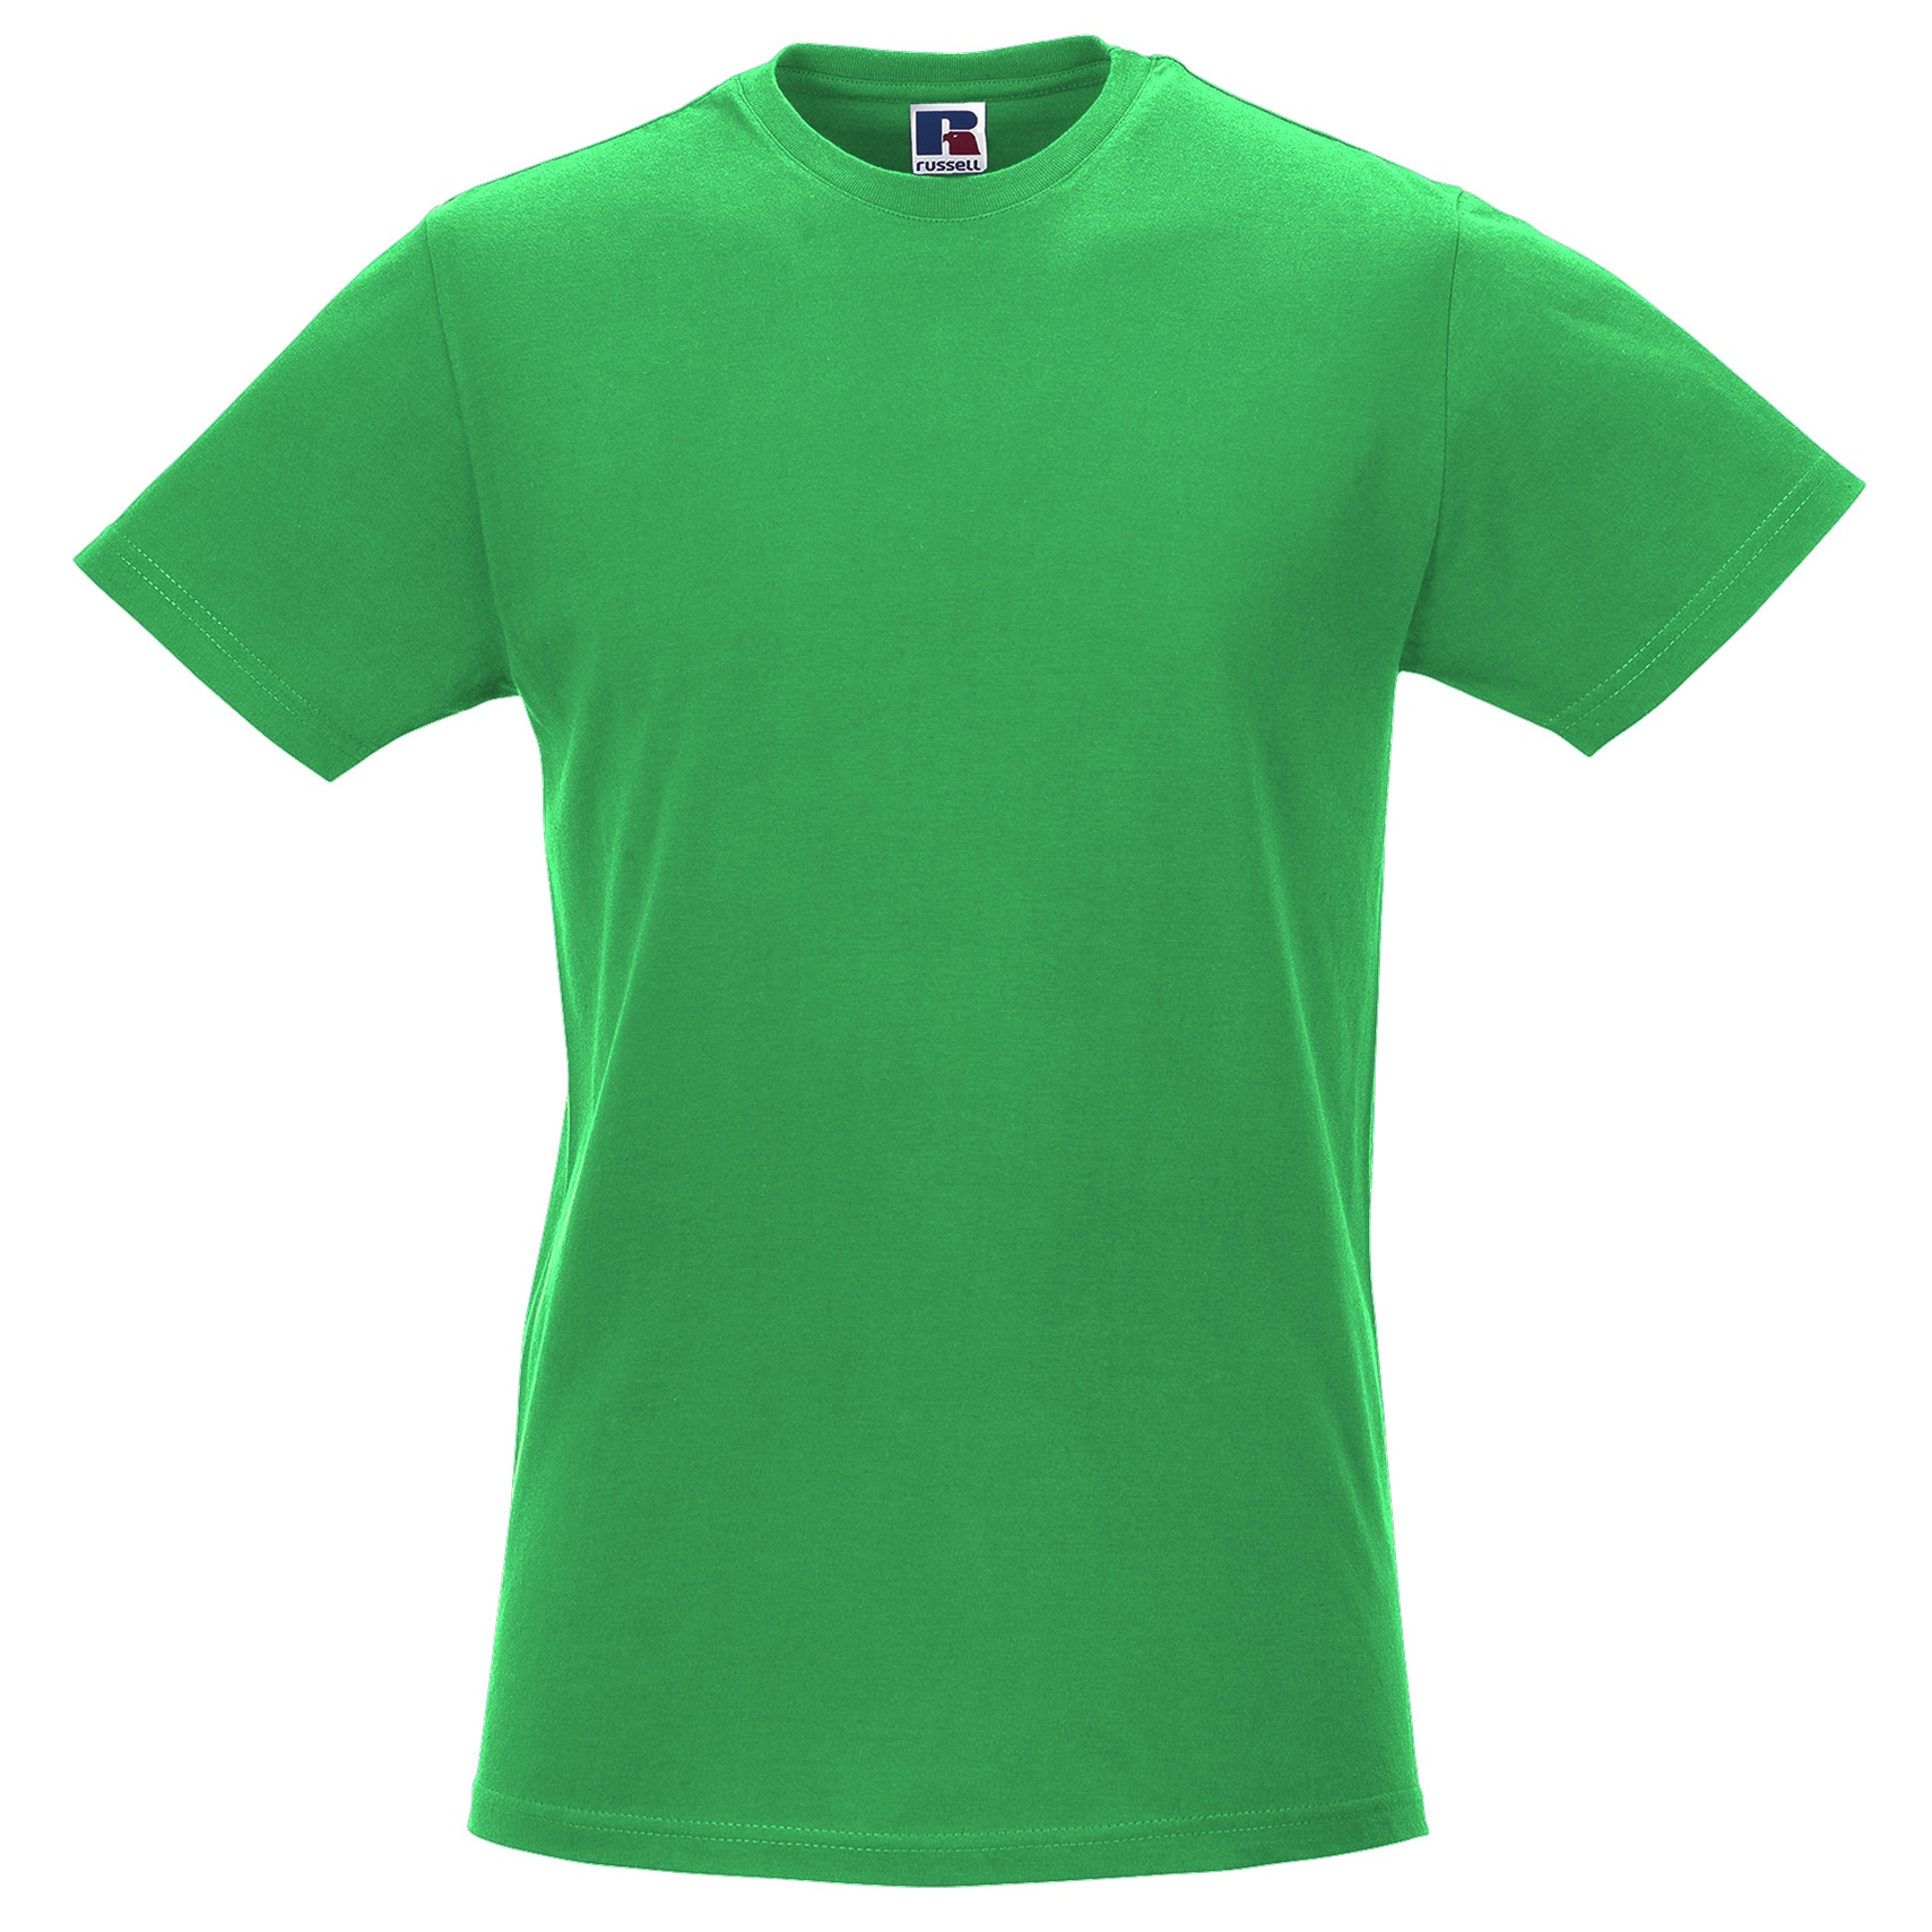 Russell-Mens-Slim-Plain-Blank-100-Cotton-Short-Sleeve-T-Shirt-Tee-BC1515 thumbnail 25